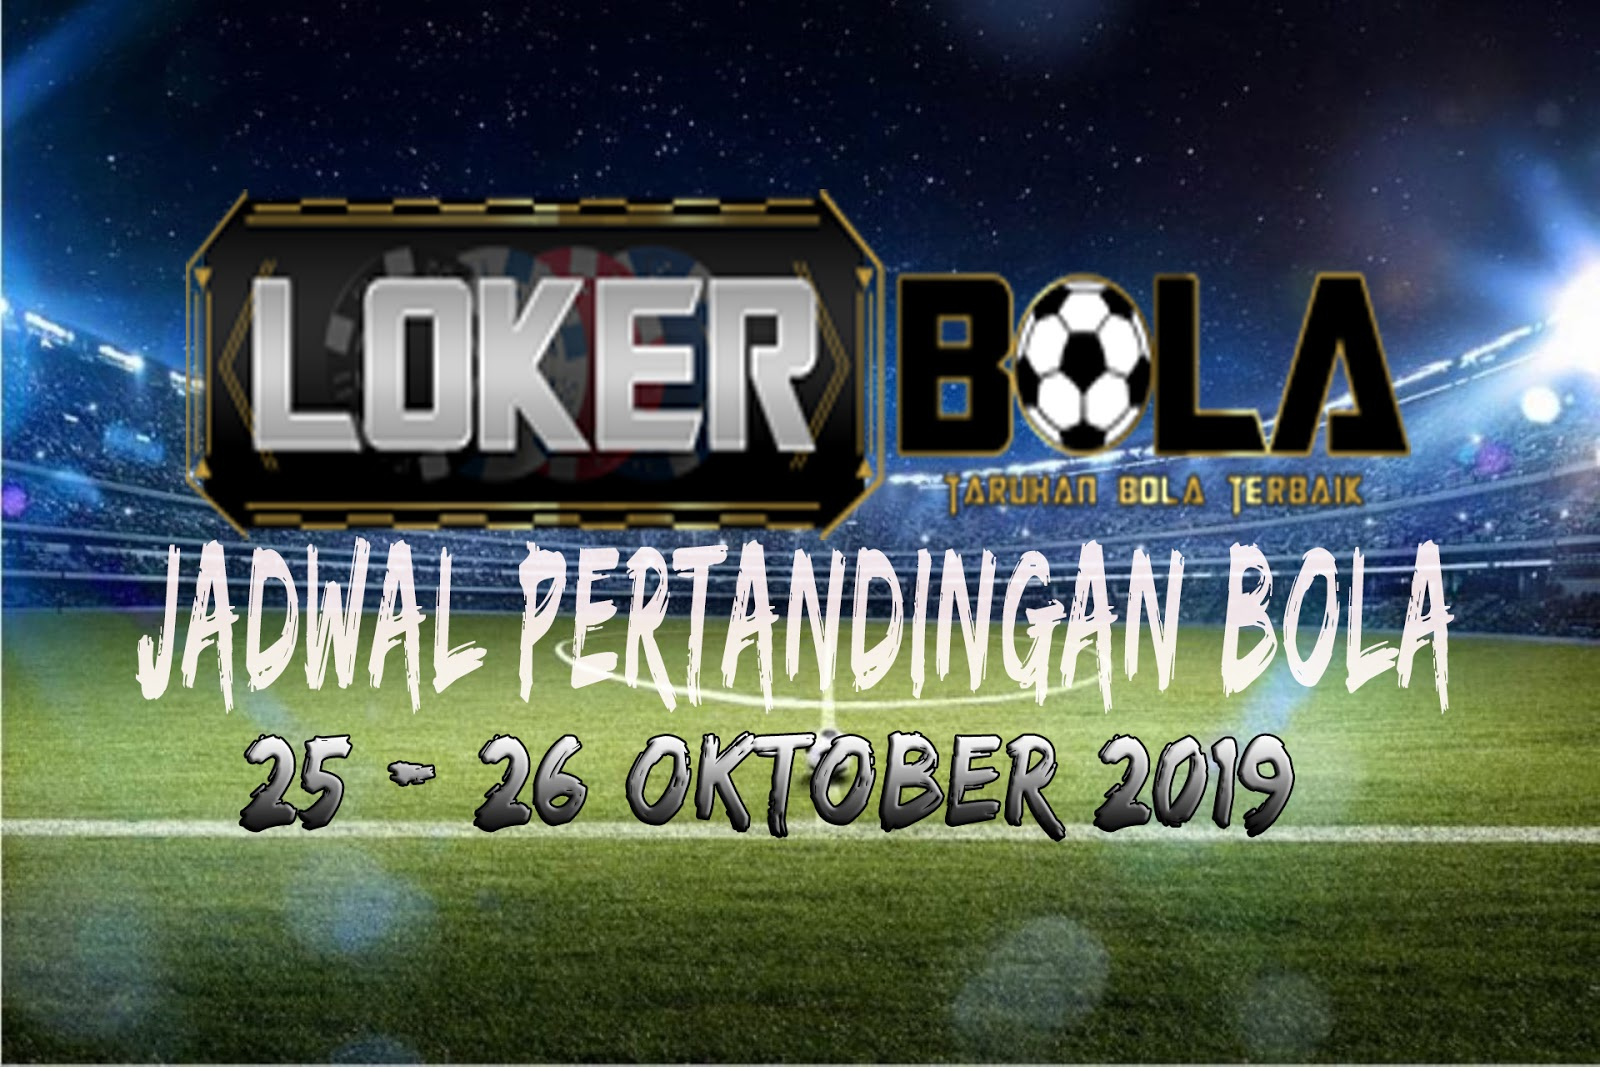 JADWAL PERTANDINGAN BOLA 25 – 26 OKTOBER 2019